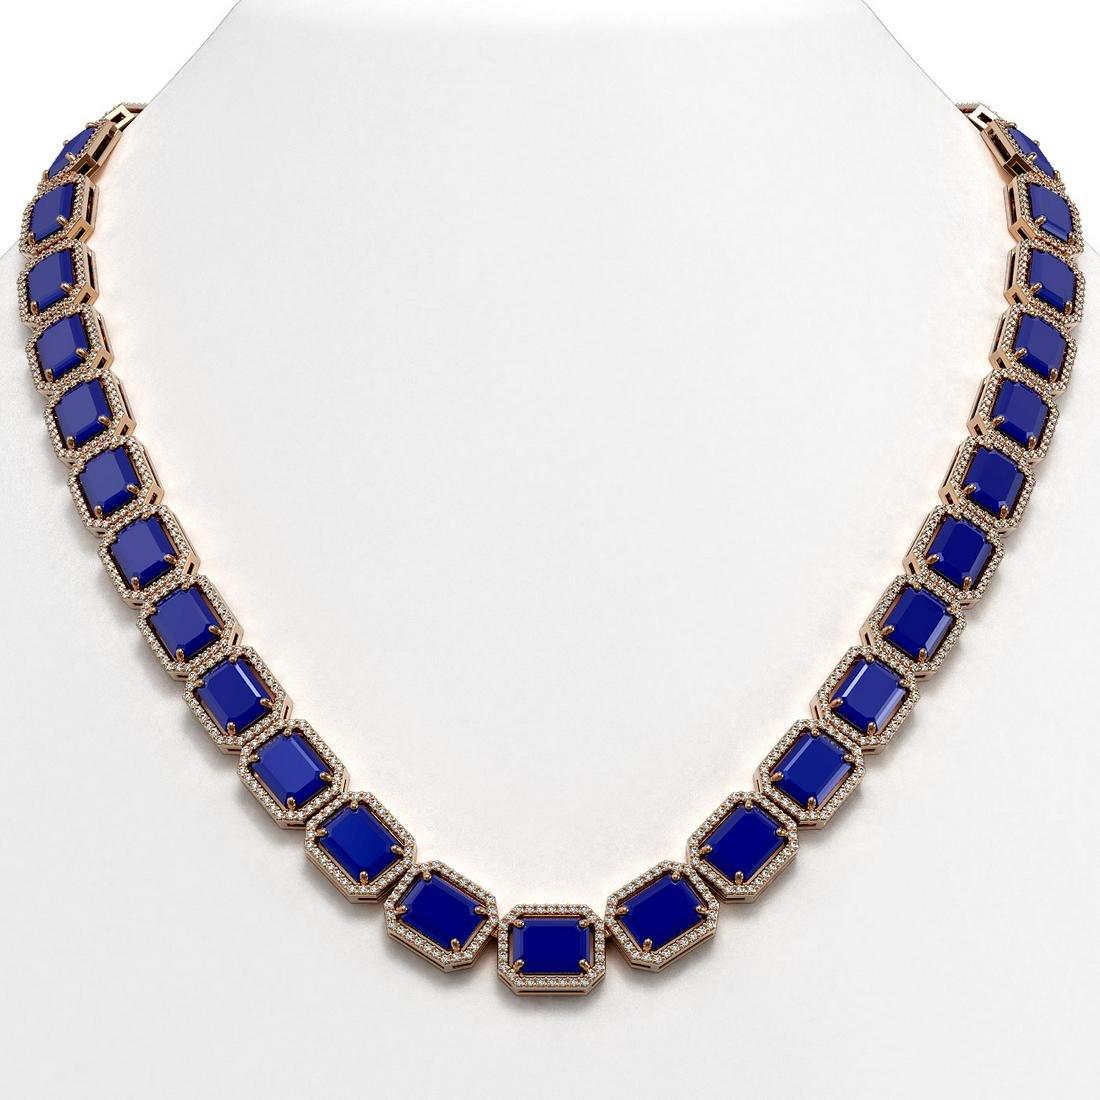 84.94 ctw Sapphire & Diamond Halo Necklace 10K Rose